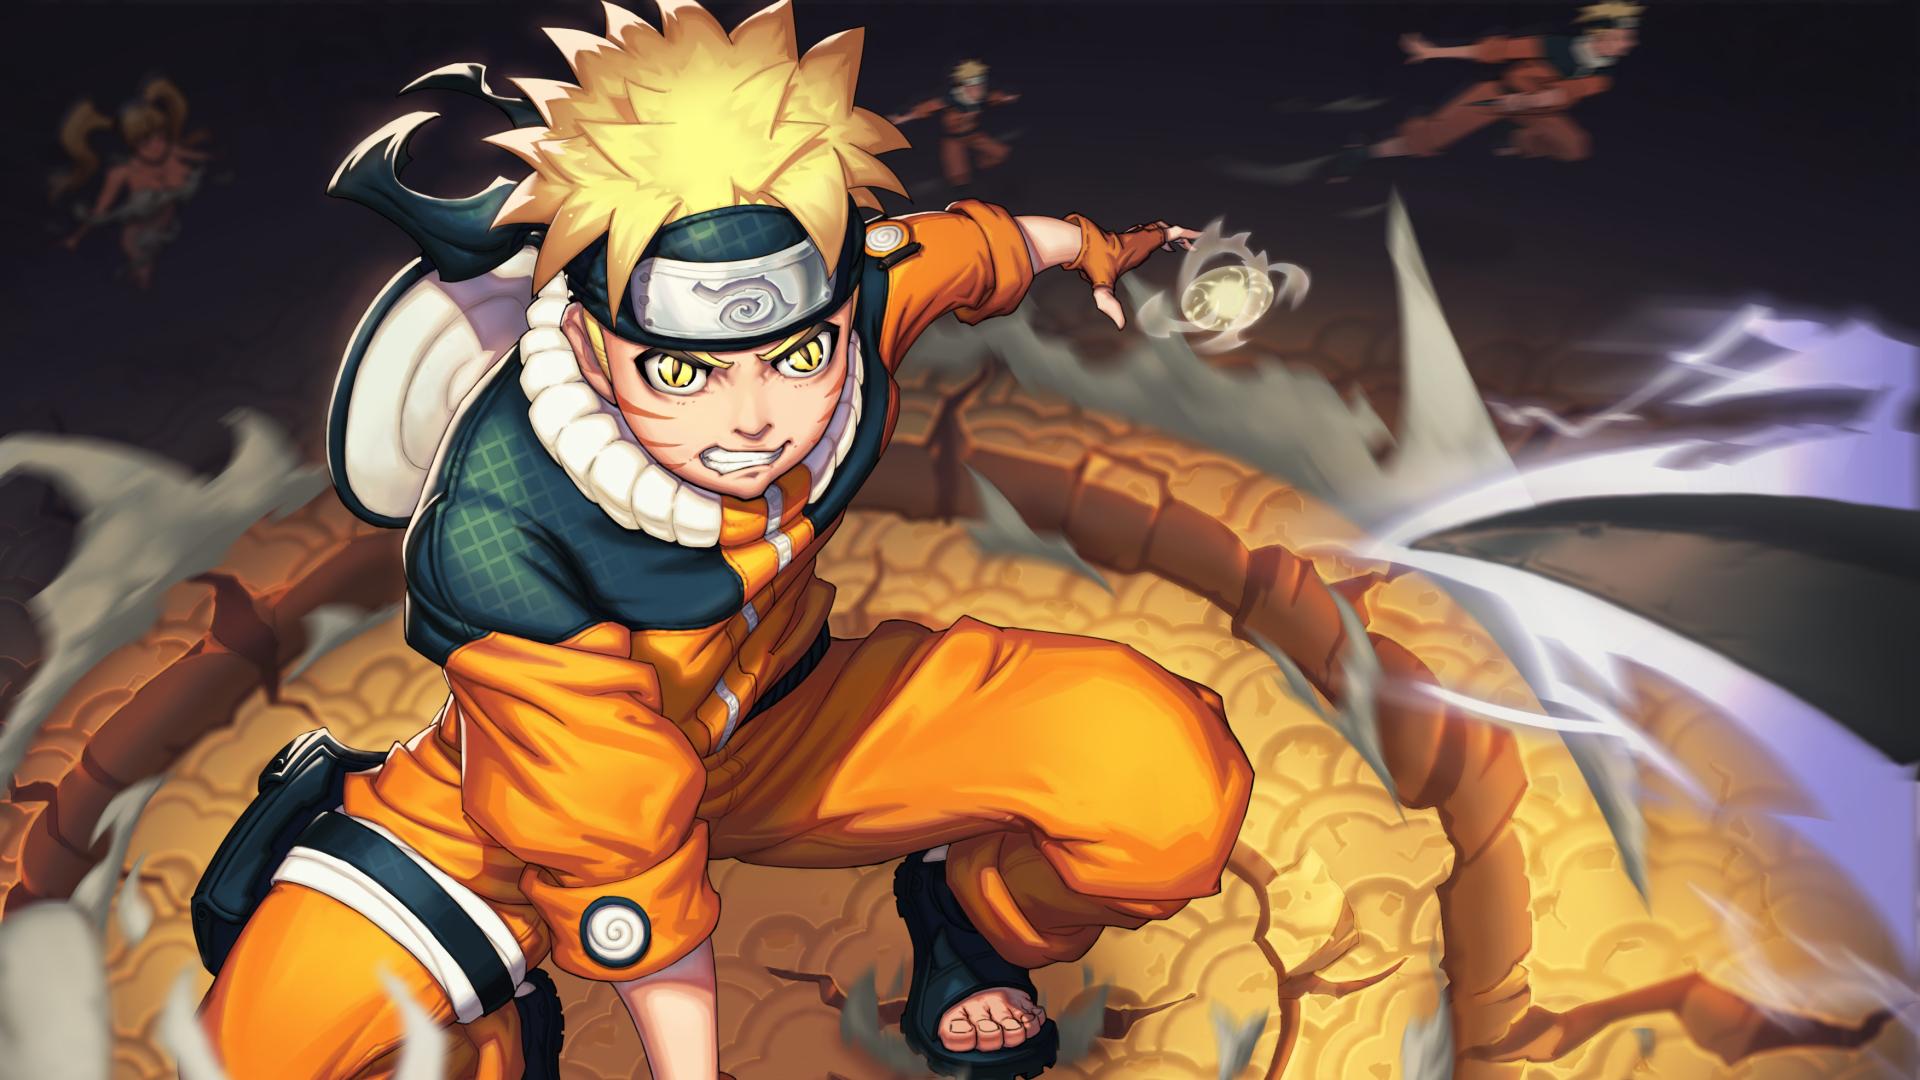 1920x1080 Naruto Uzumaki 4K Art 1080P Laptop Full HD ...